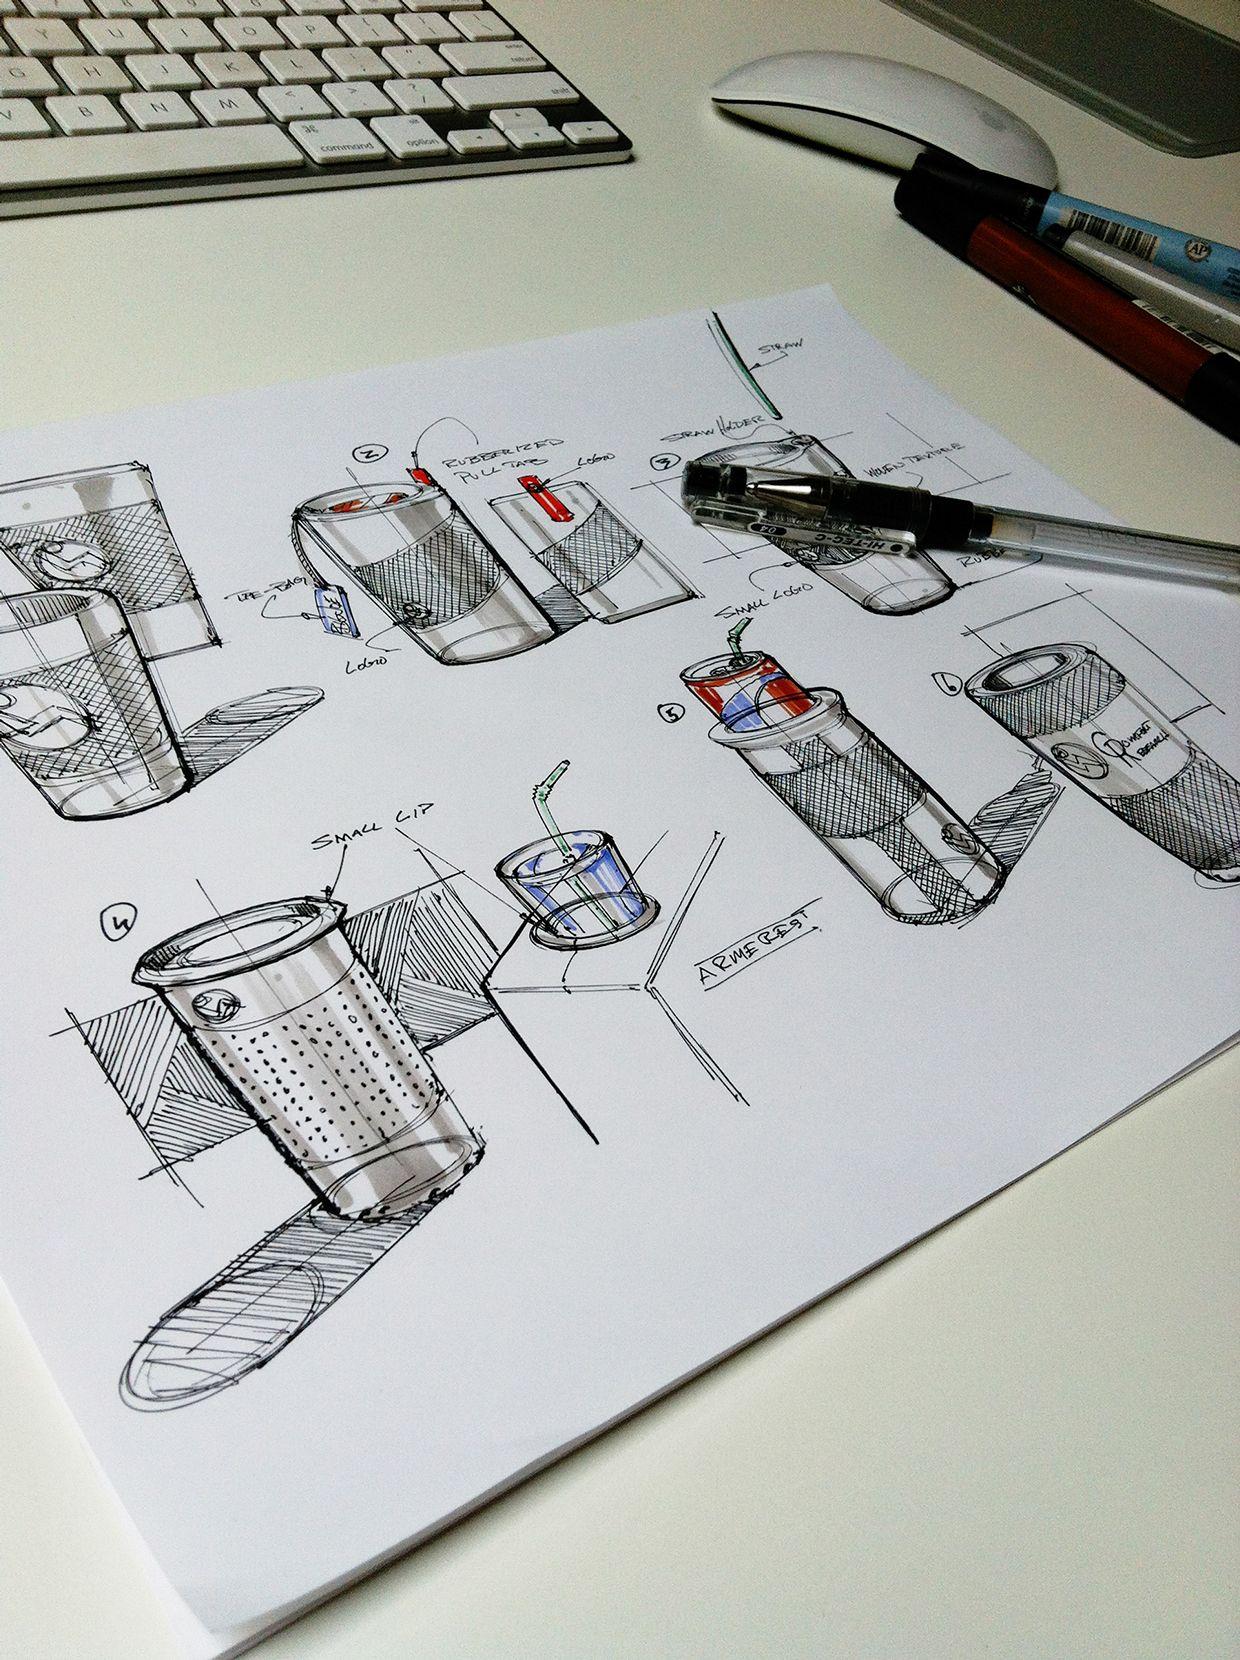 Fun Stuff on Behance | Skizze | Pinterest | Product design sketching ...